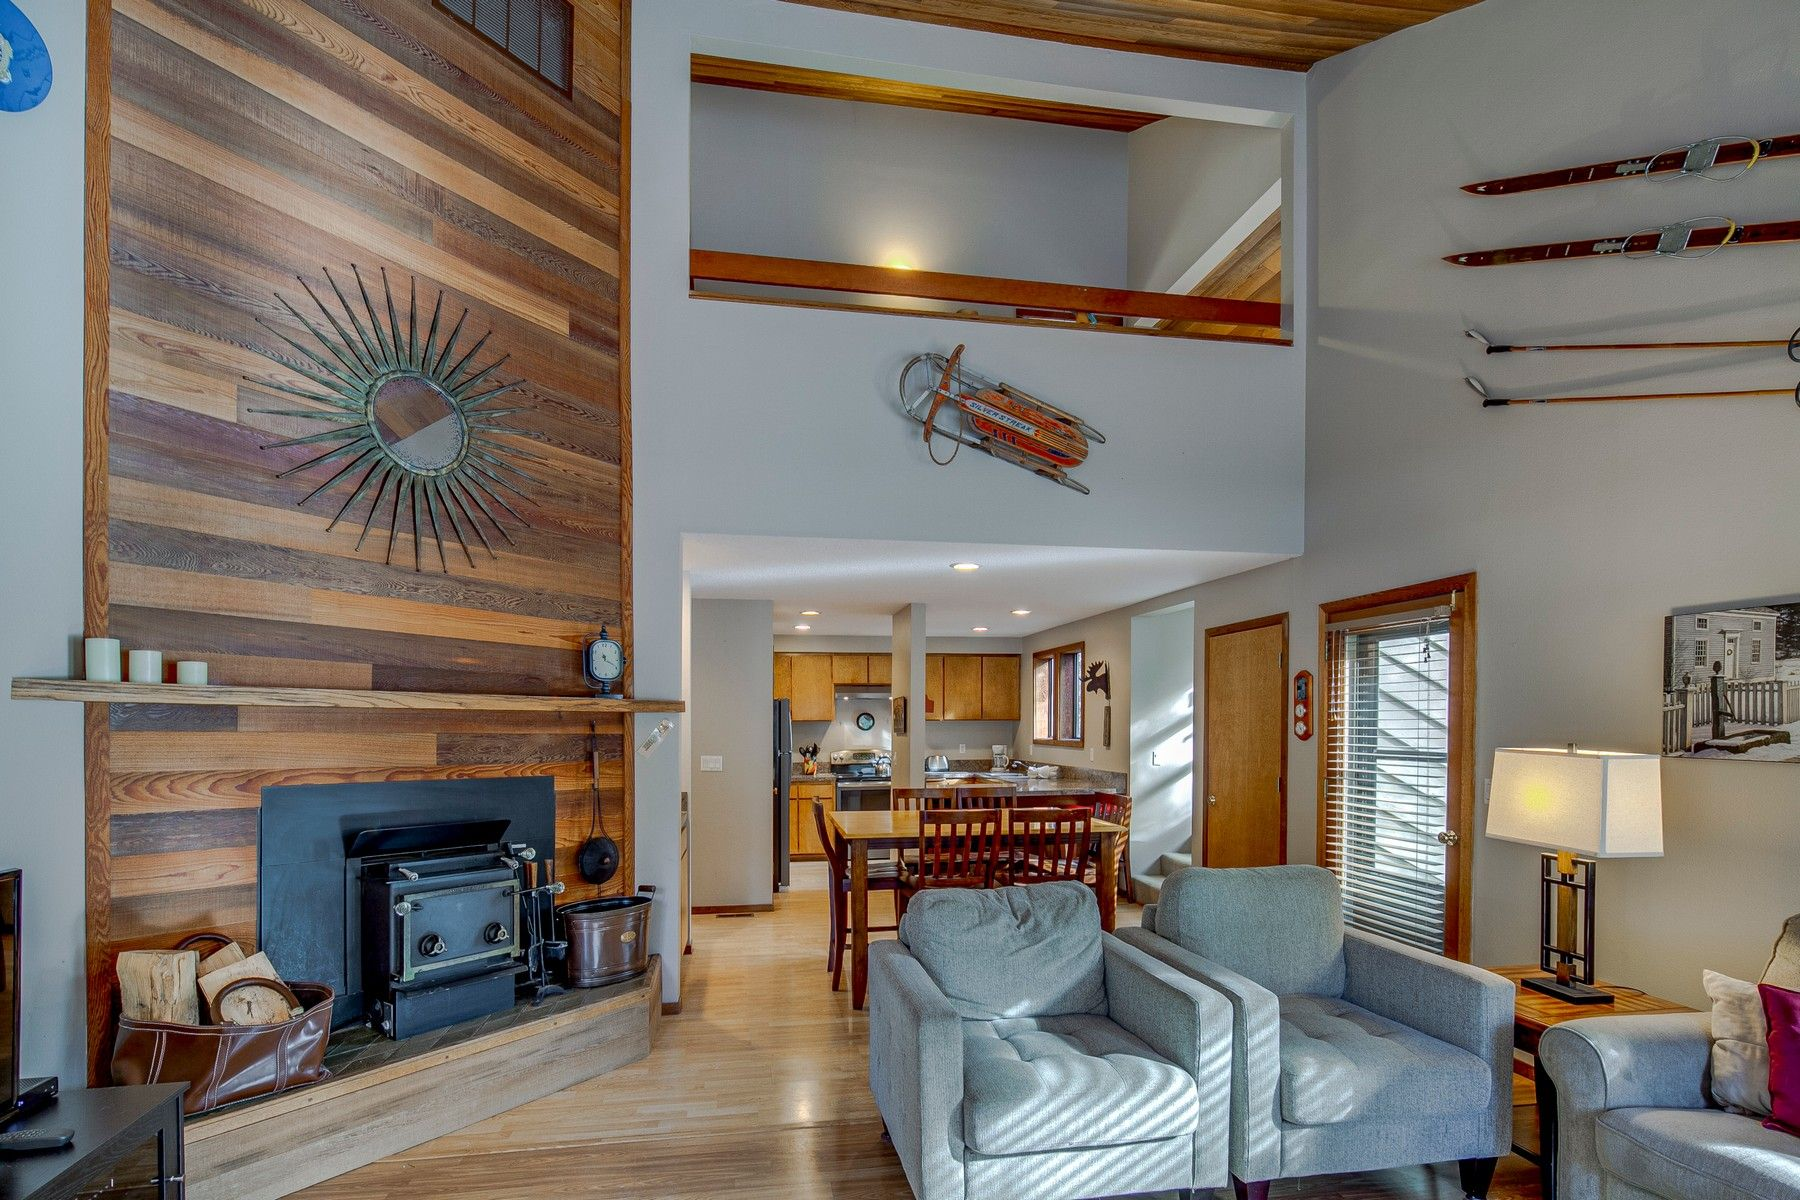 Other Residential Homes για την Πώληση στο 18013 Camas Lane 21 Sunriver, OR 97707 Sunriver, Ορεγκον 97707 Ηνωμένες Πολιτείες